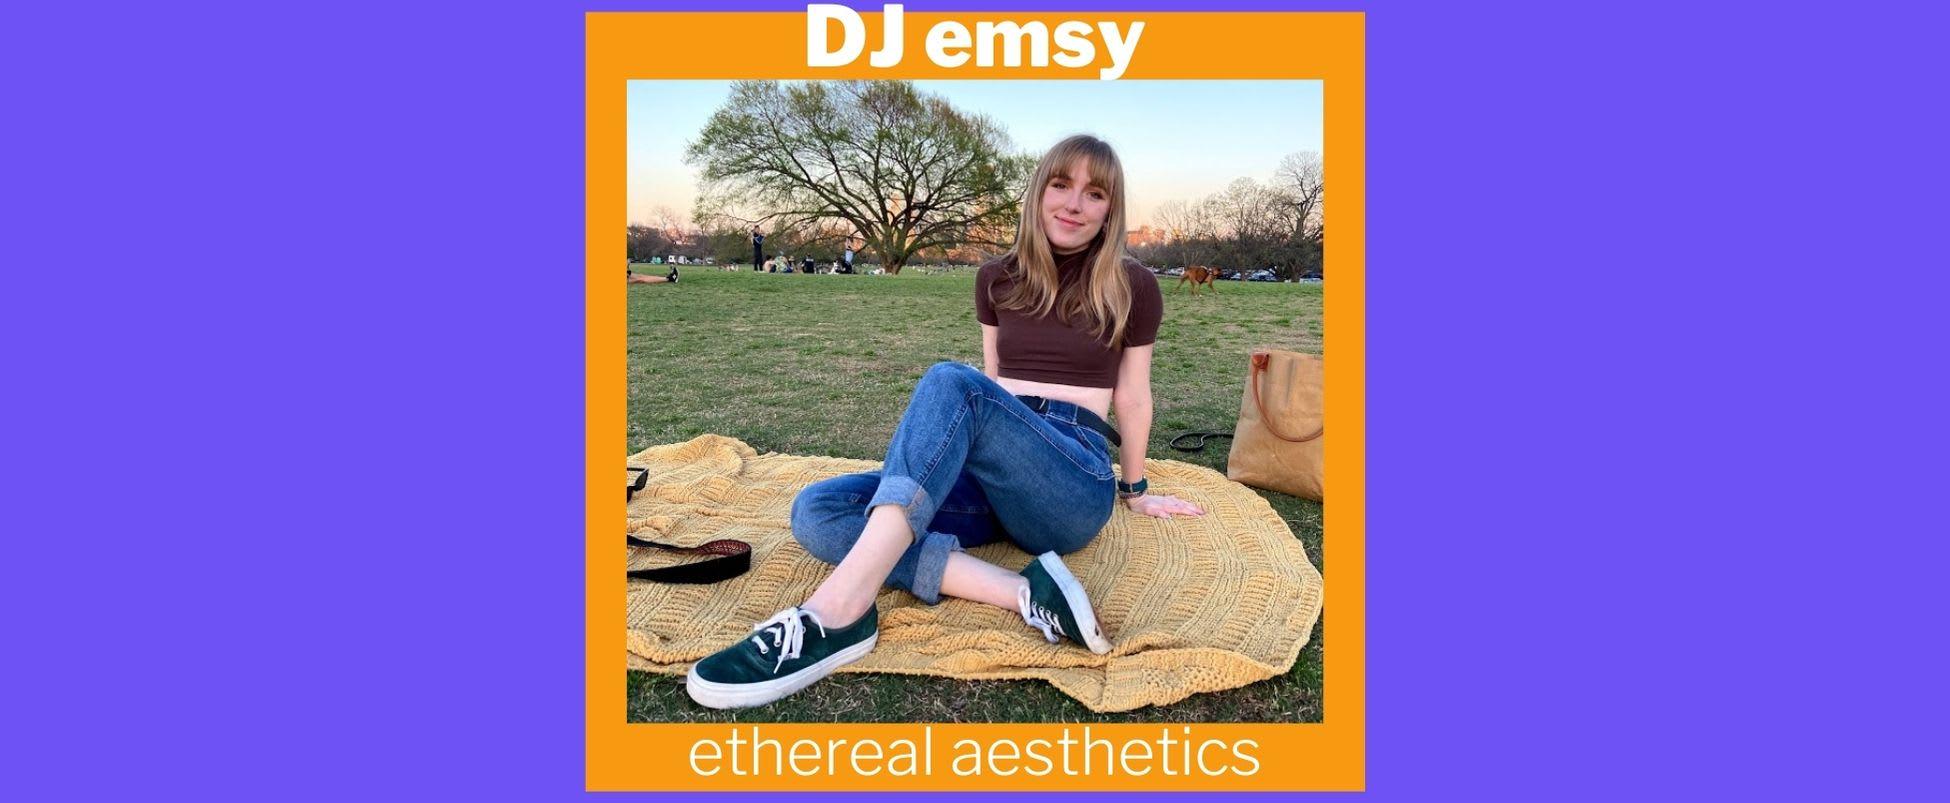 Show Spotlight: ethereal aesthetics with DJ emsy